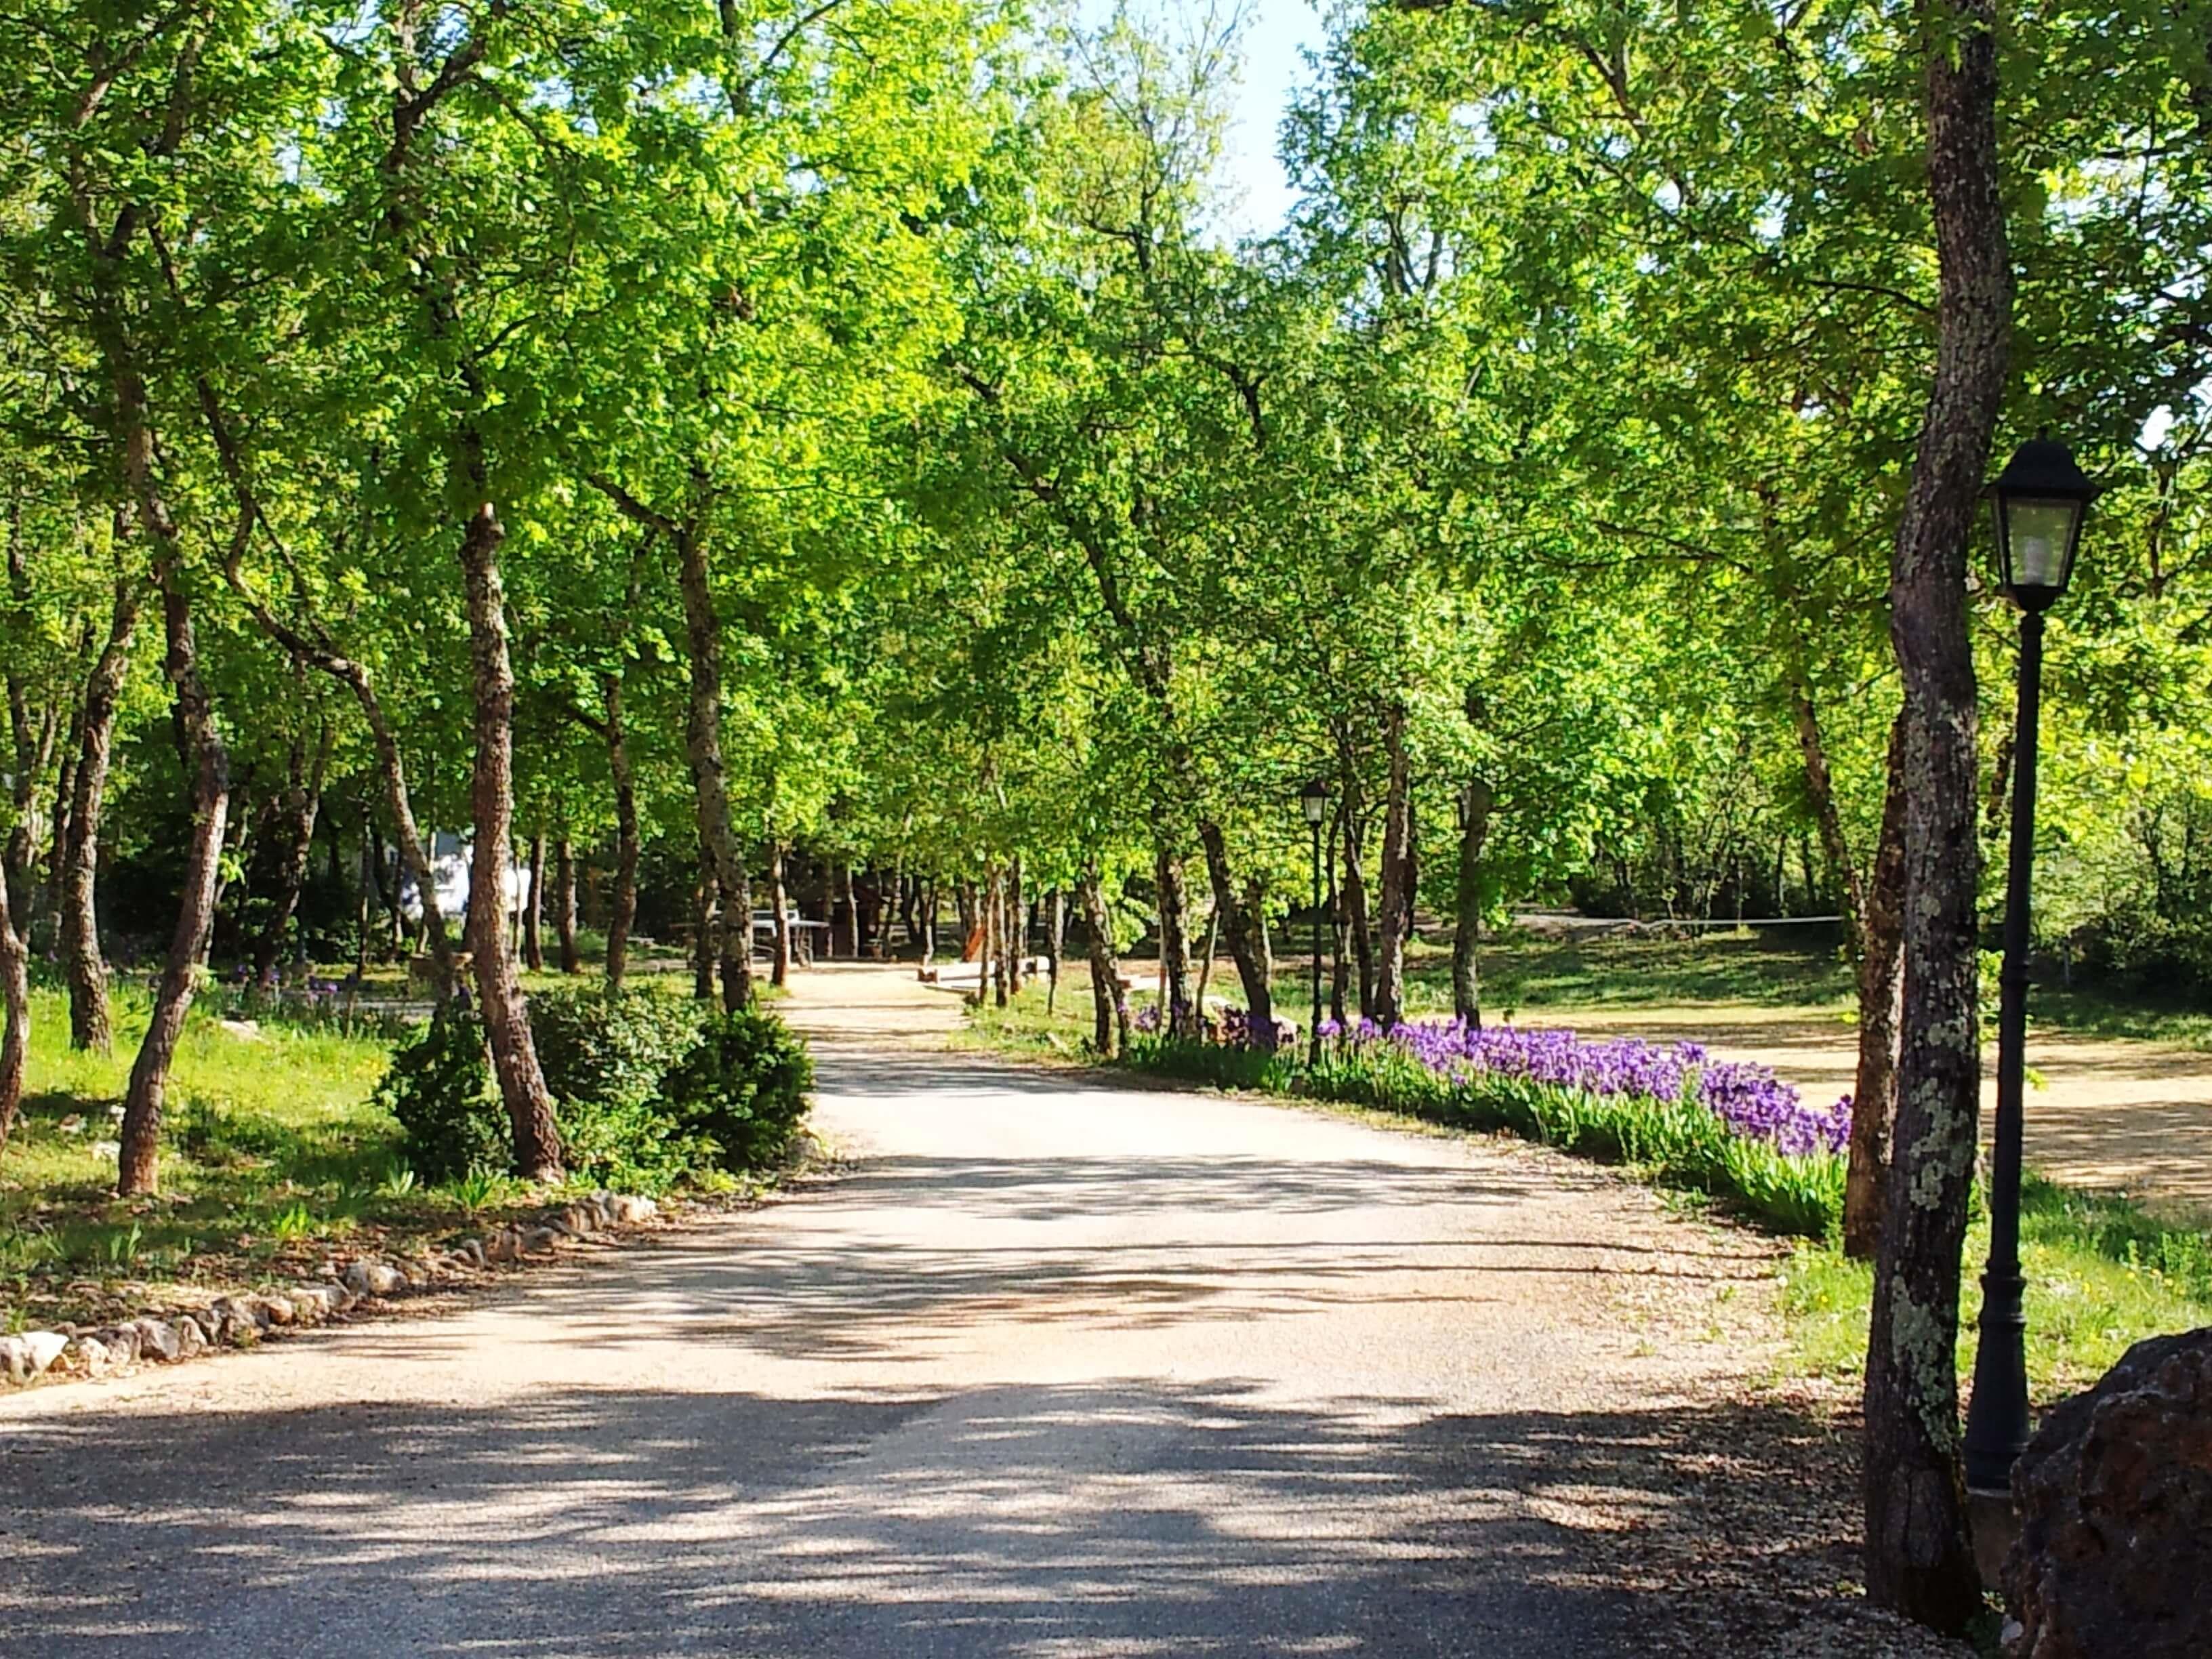 Camping 5* le Clos des Capitelles, Saint-Privat-de-Champclos, Gard